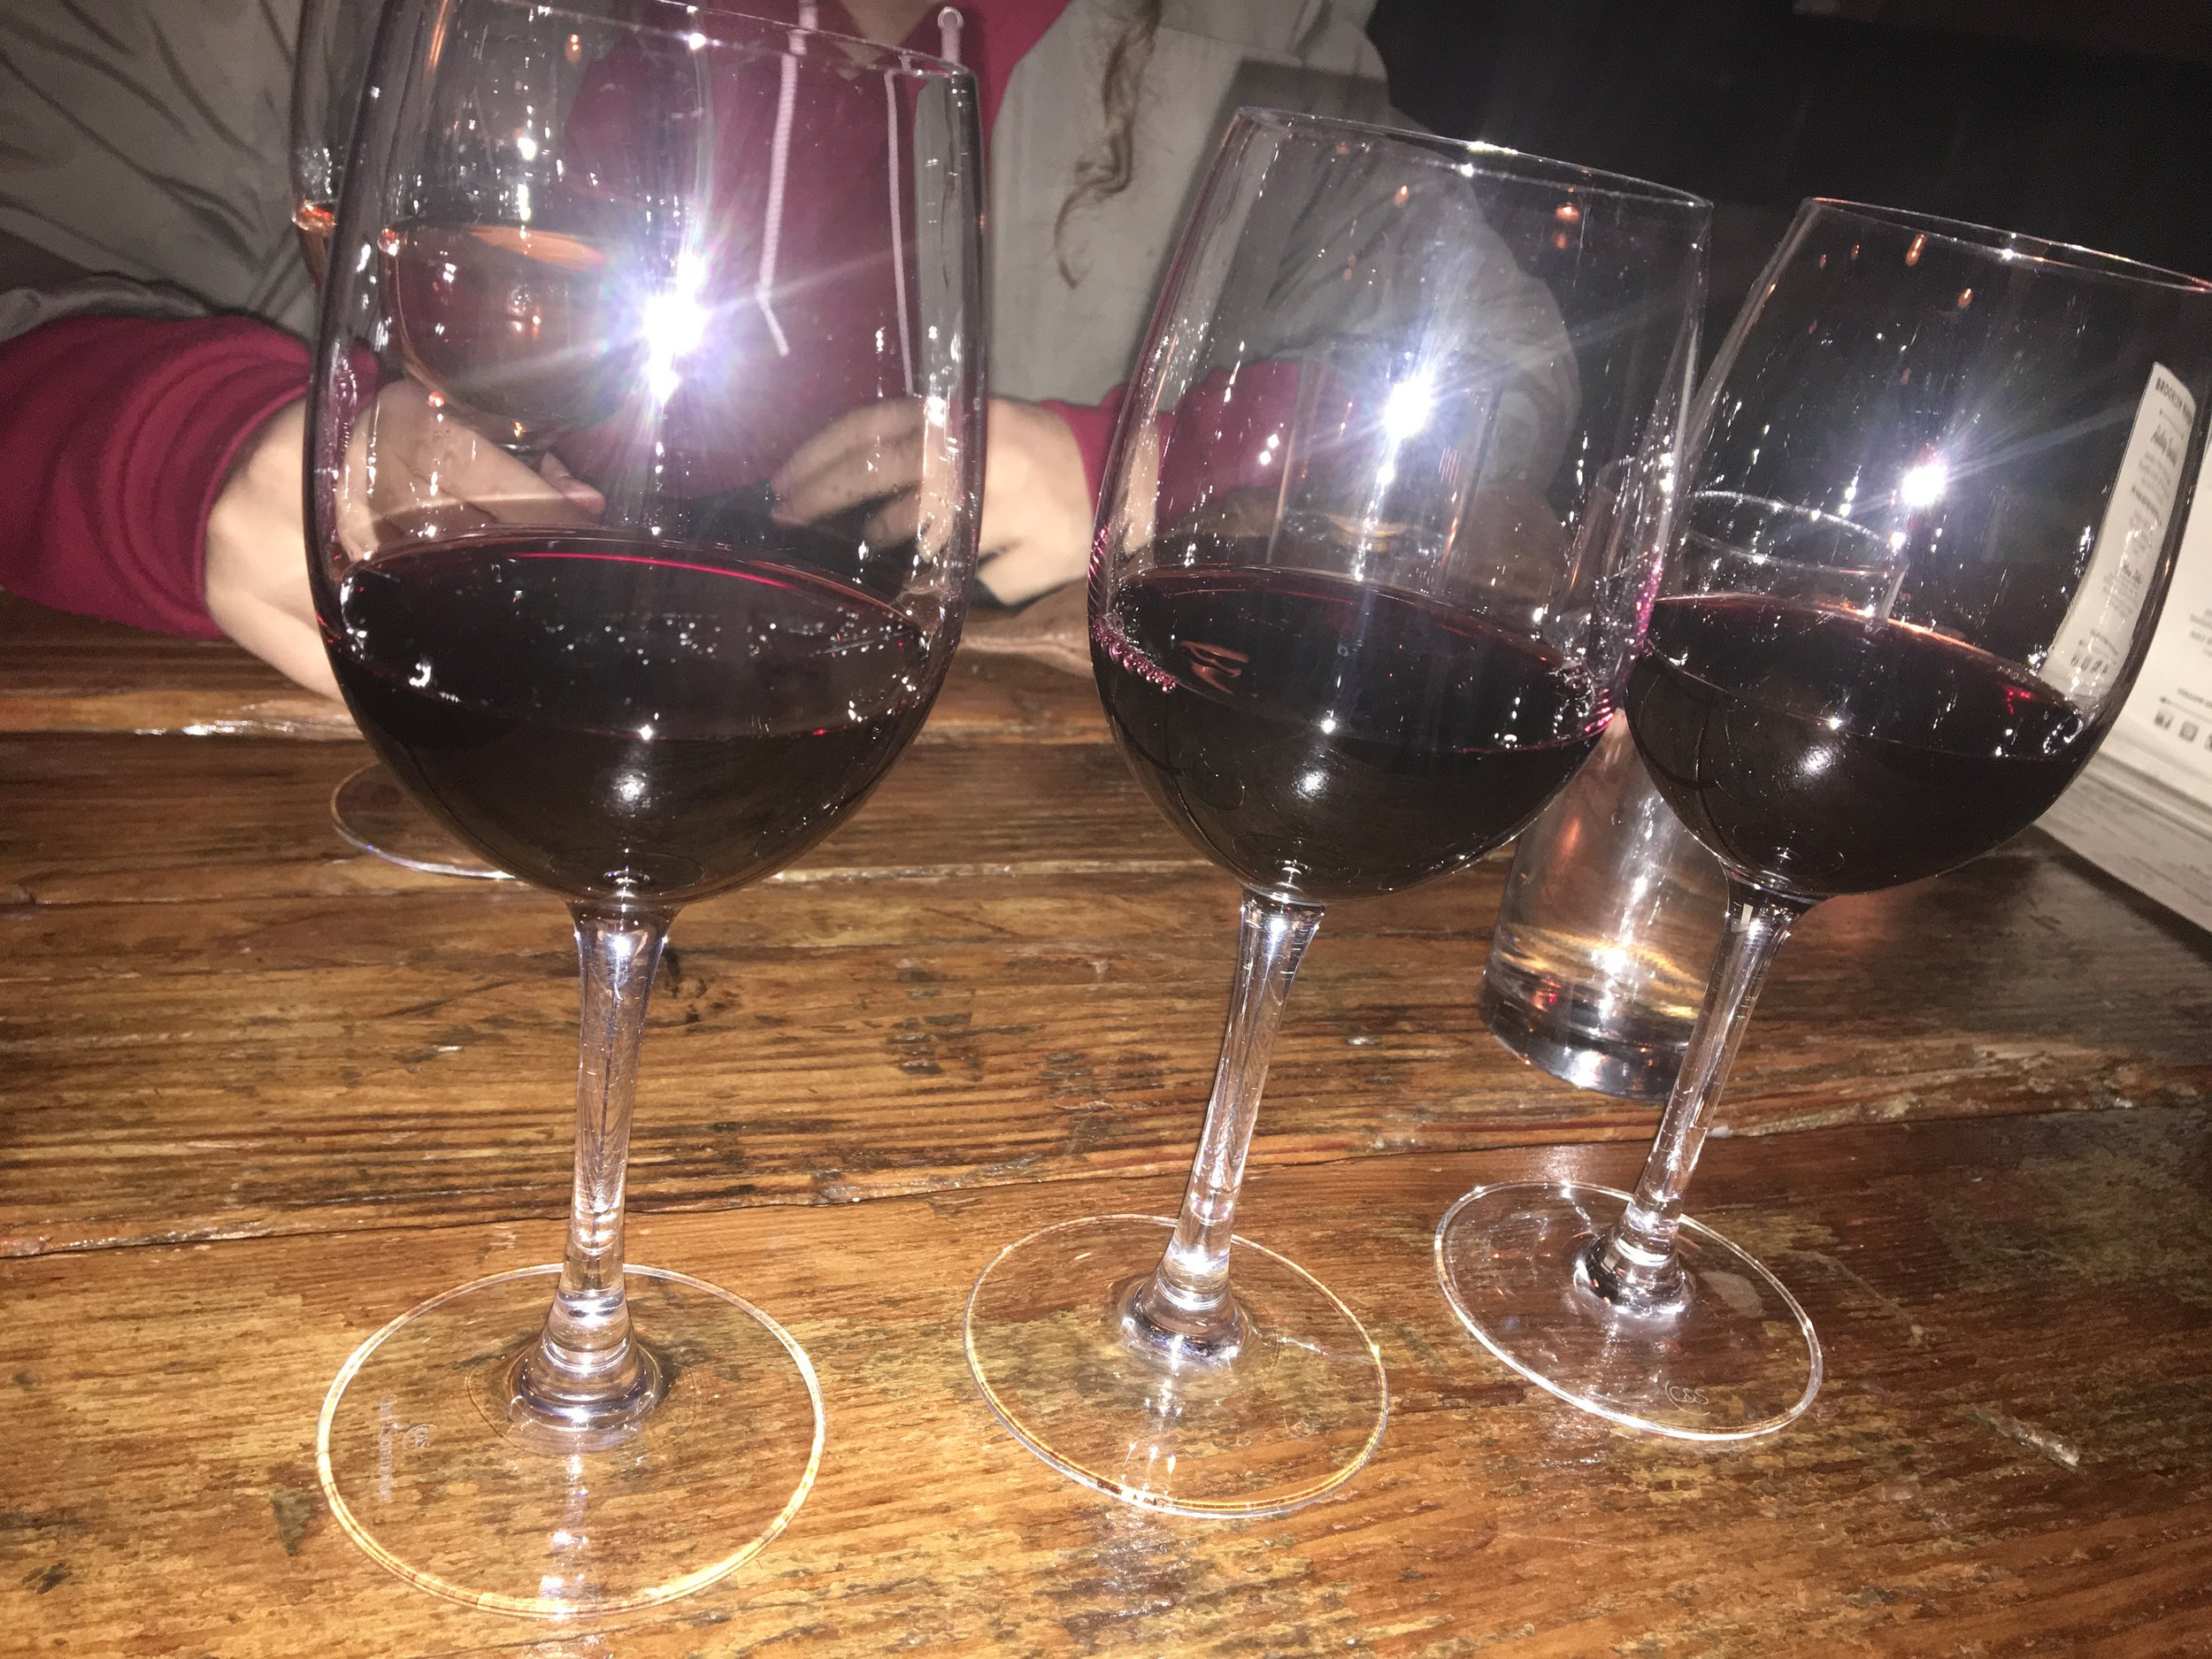 What:  Flight of Stern & Serious – Reserve Merlot, Cabernet Sauvignon – Sonoma, and Old Vine Zinfandel